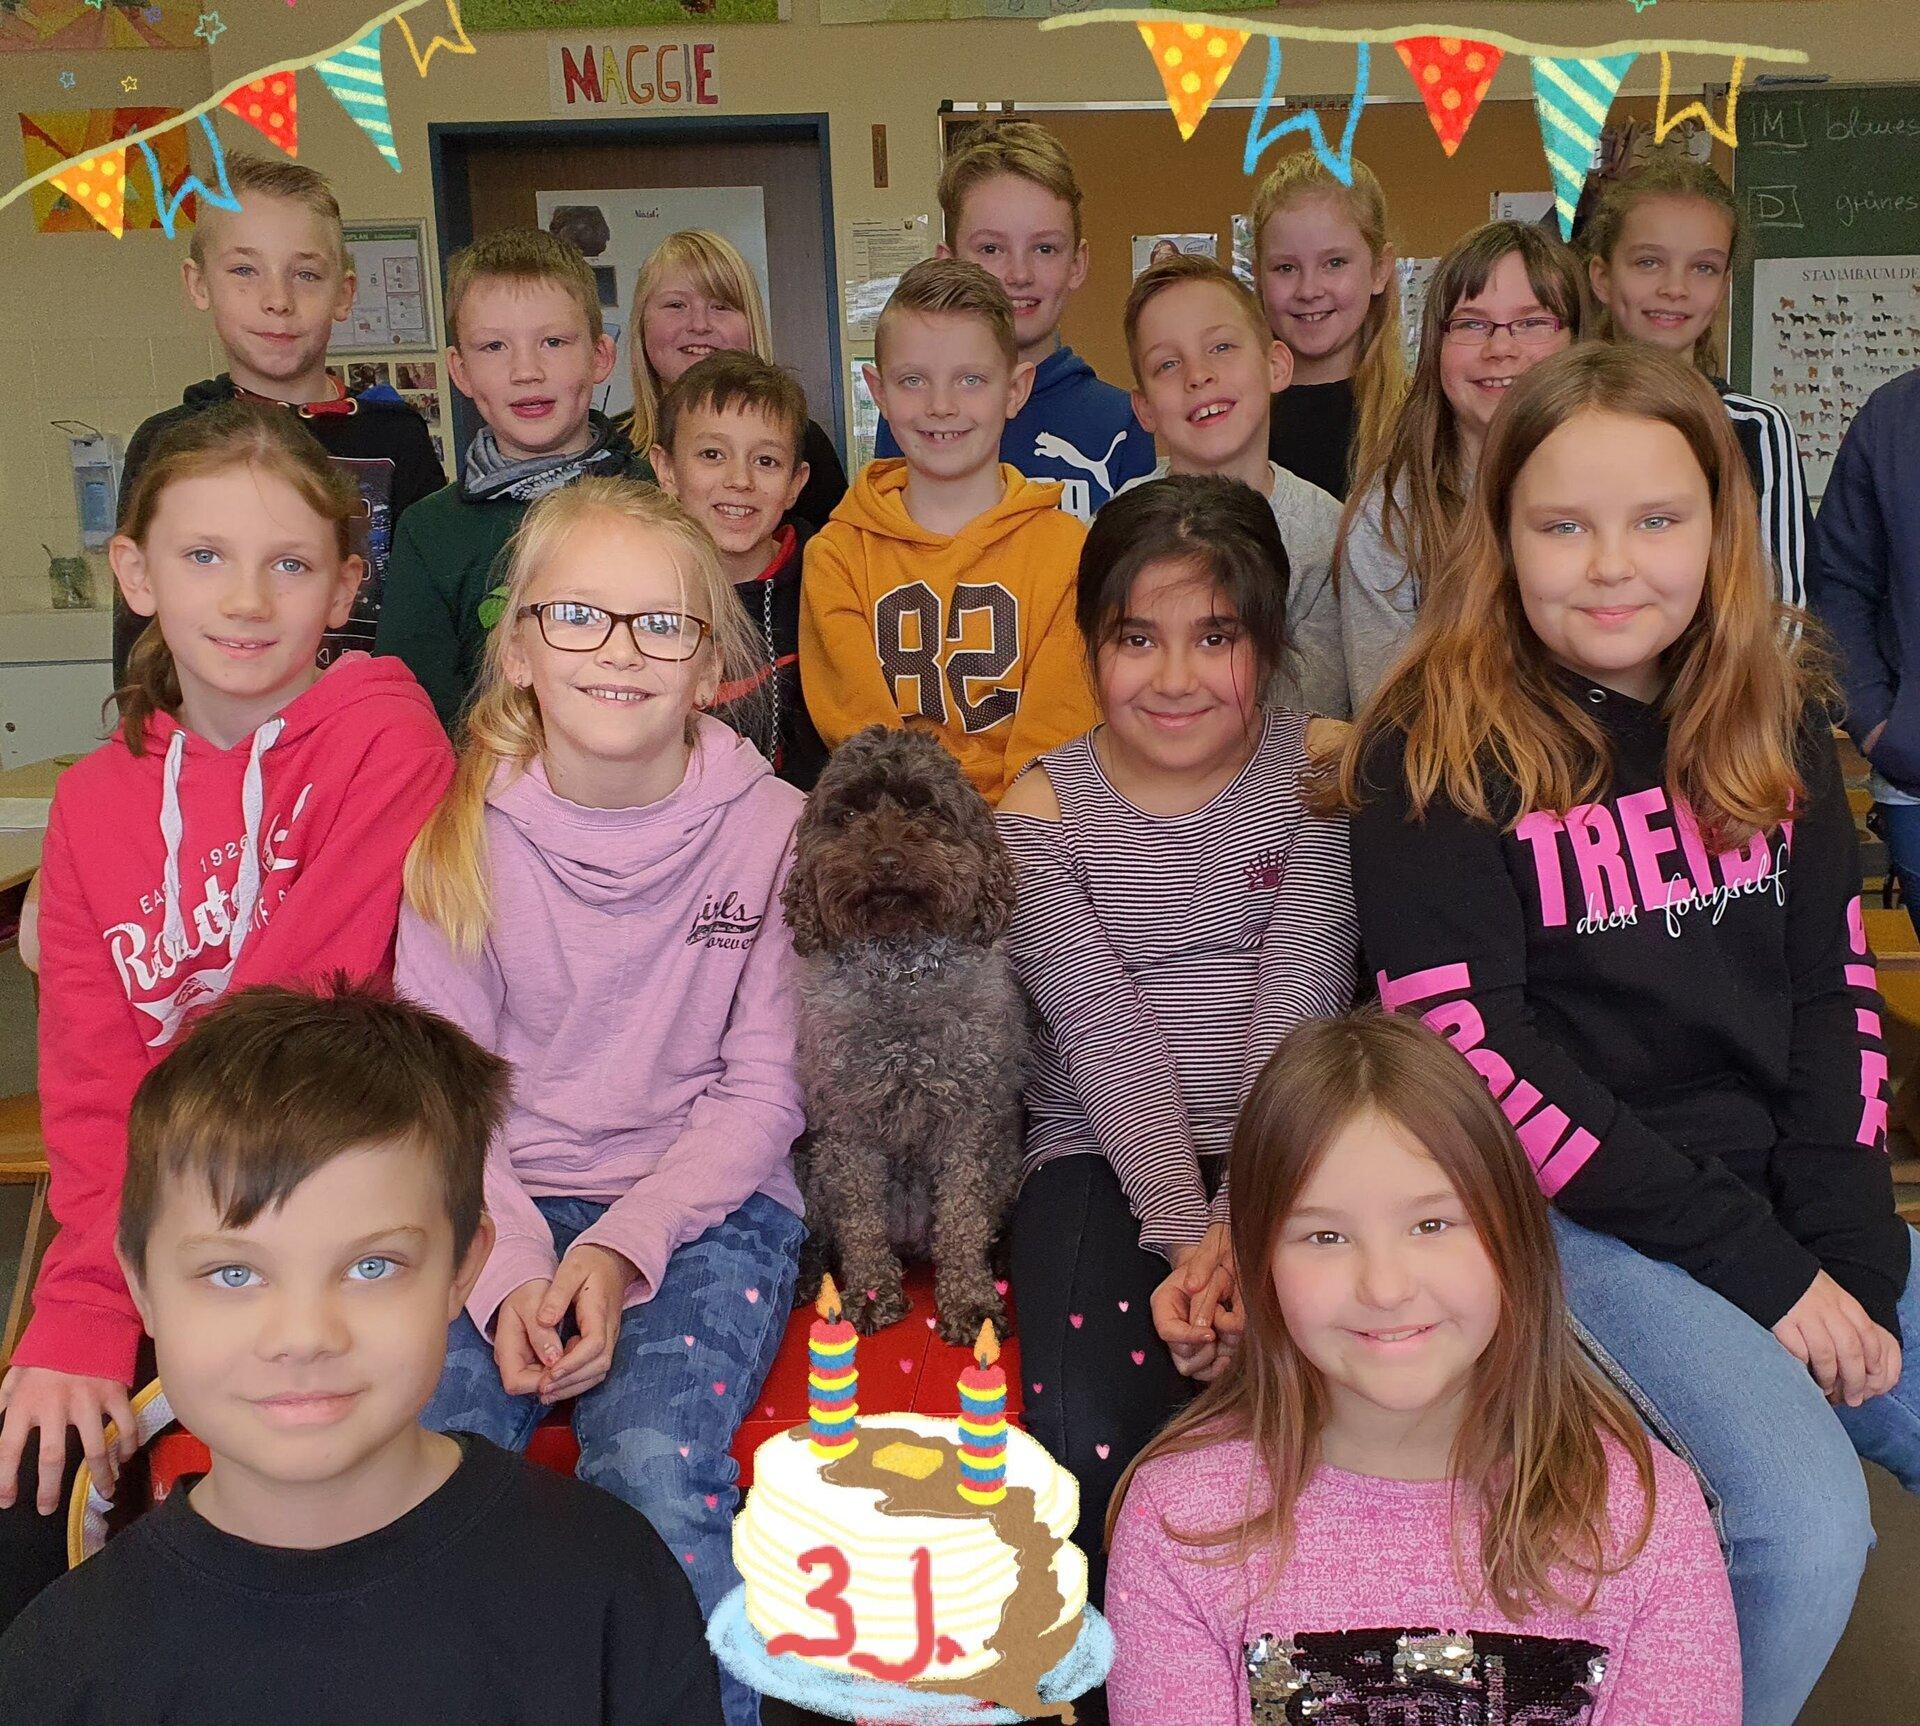 Maggies 3ter Geburtstag